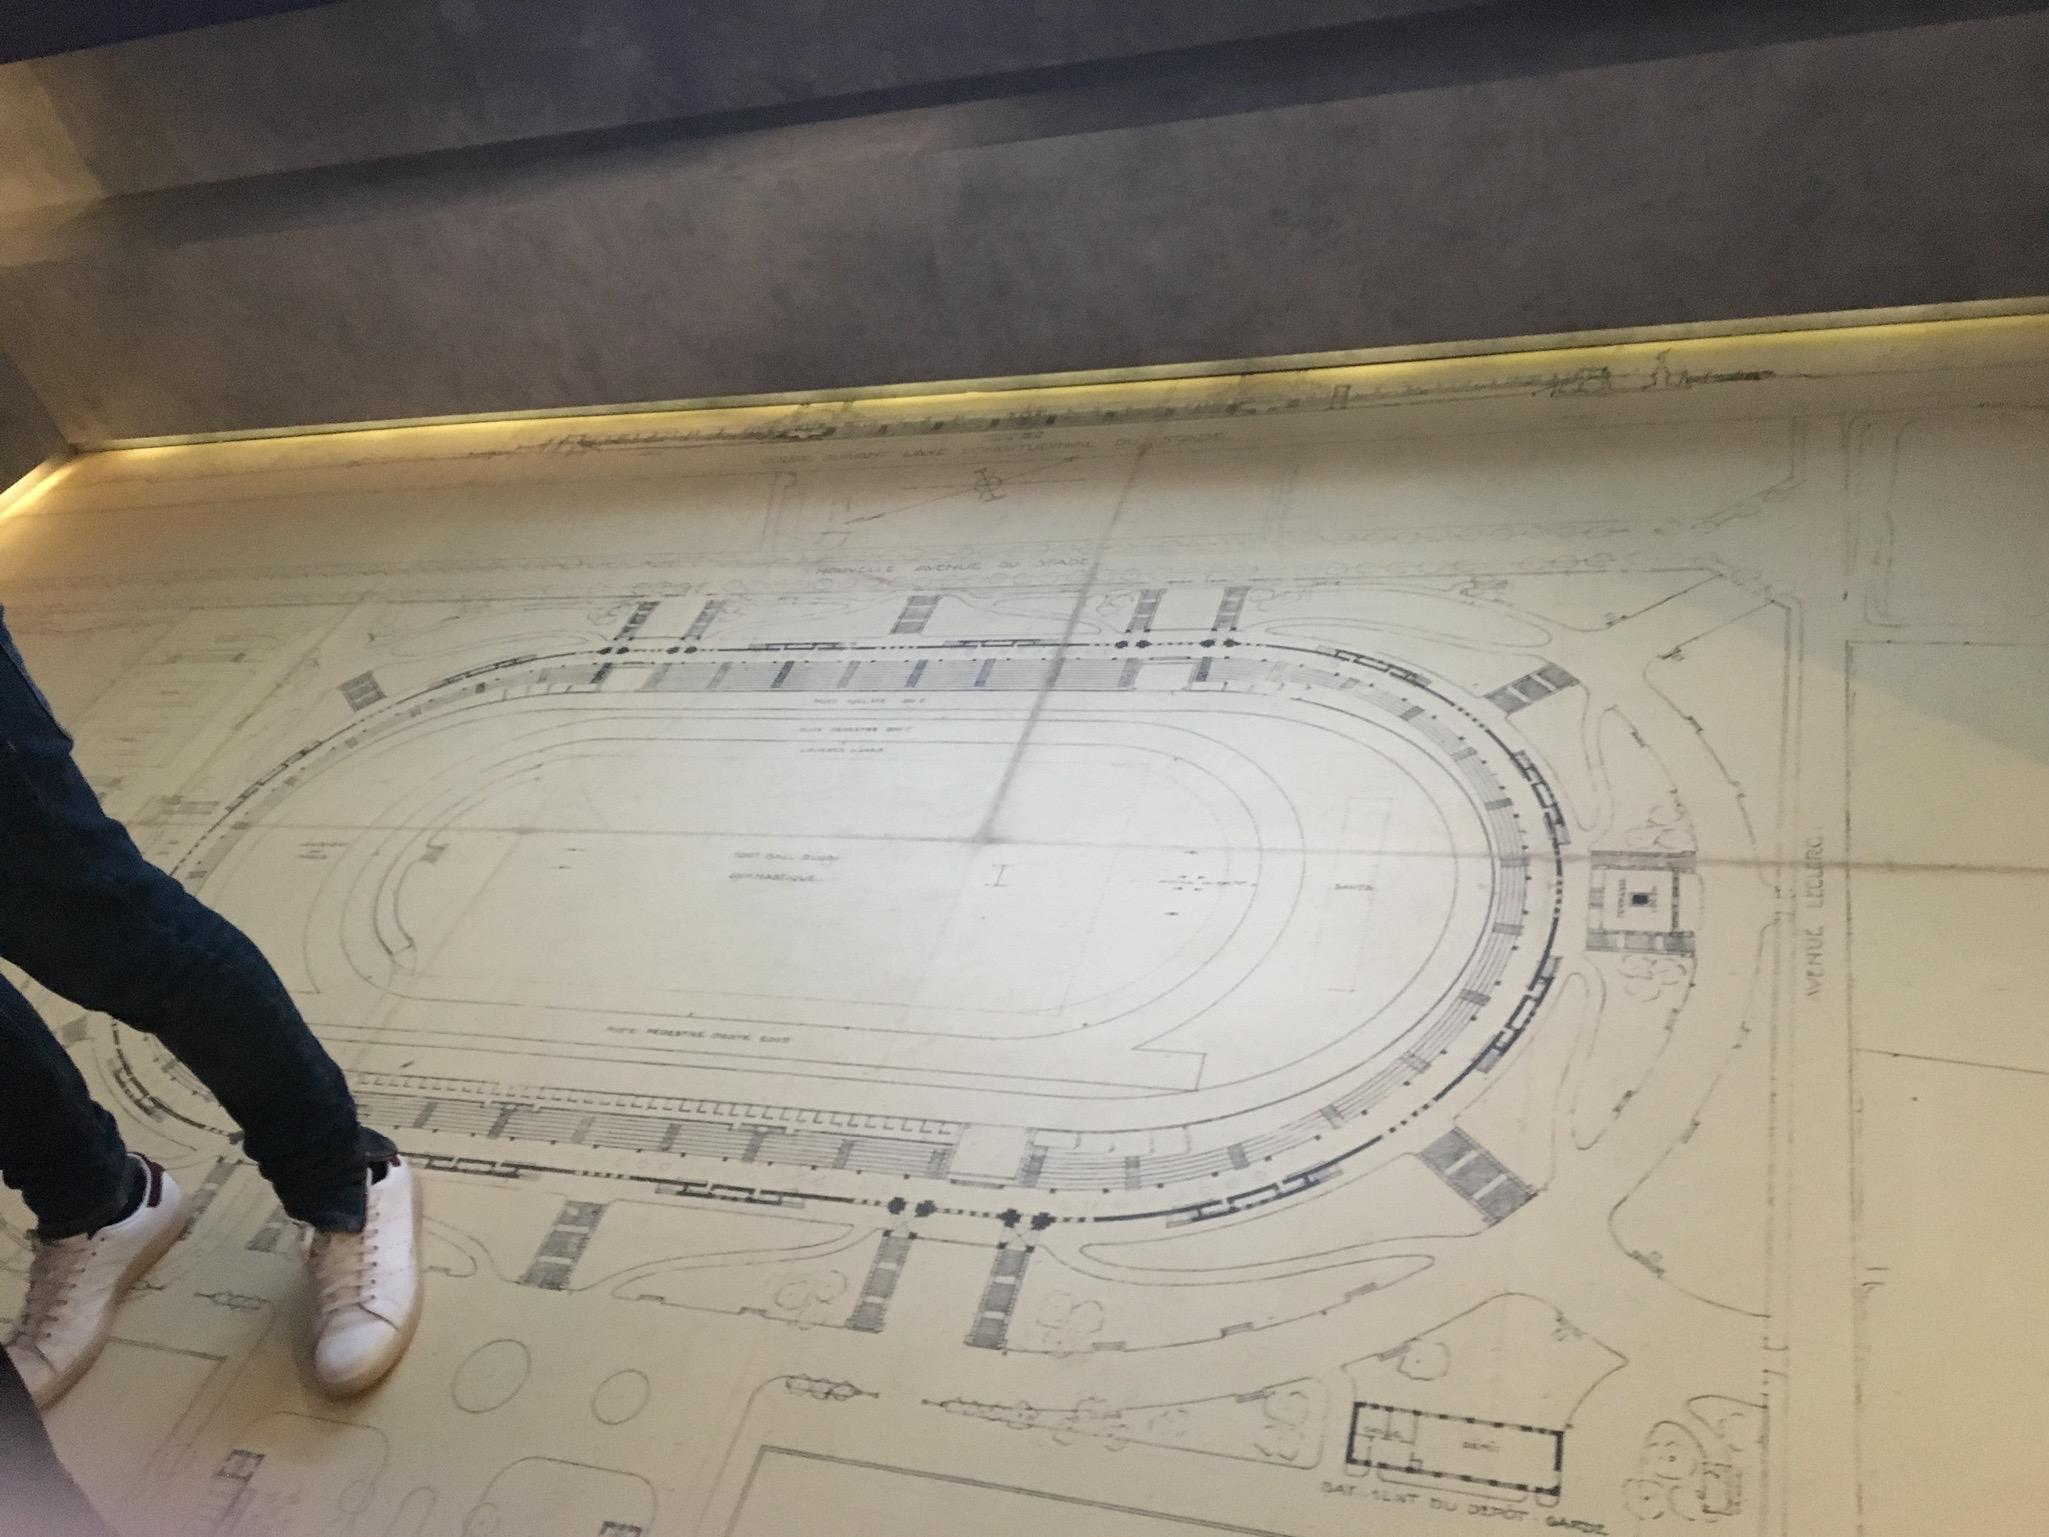 Plan stade Gerland Musée OL